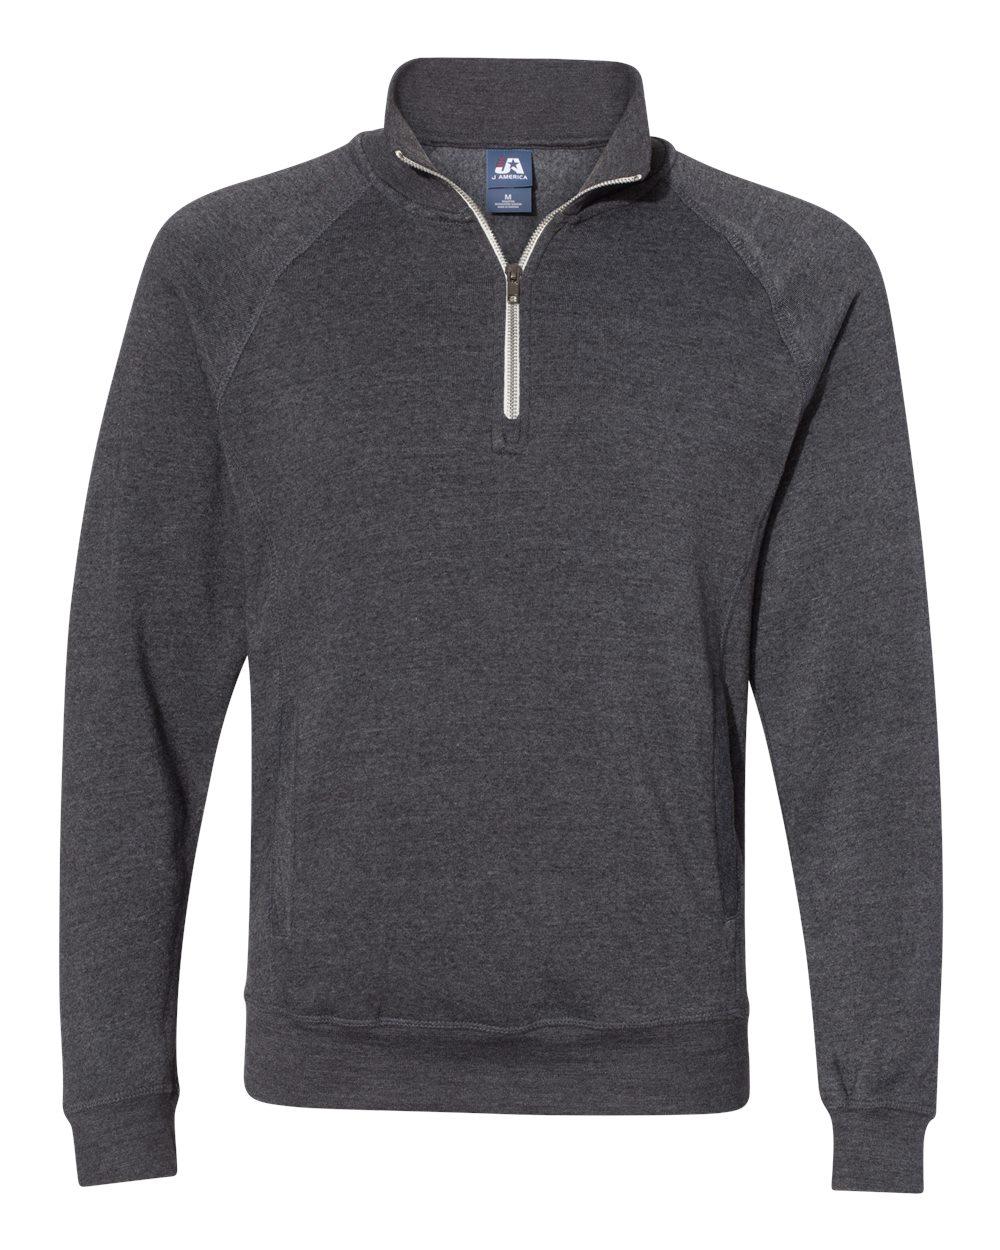 J. America 8869 - Triblend 1/4 Zip Pullover Sweatshirt